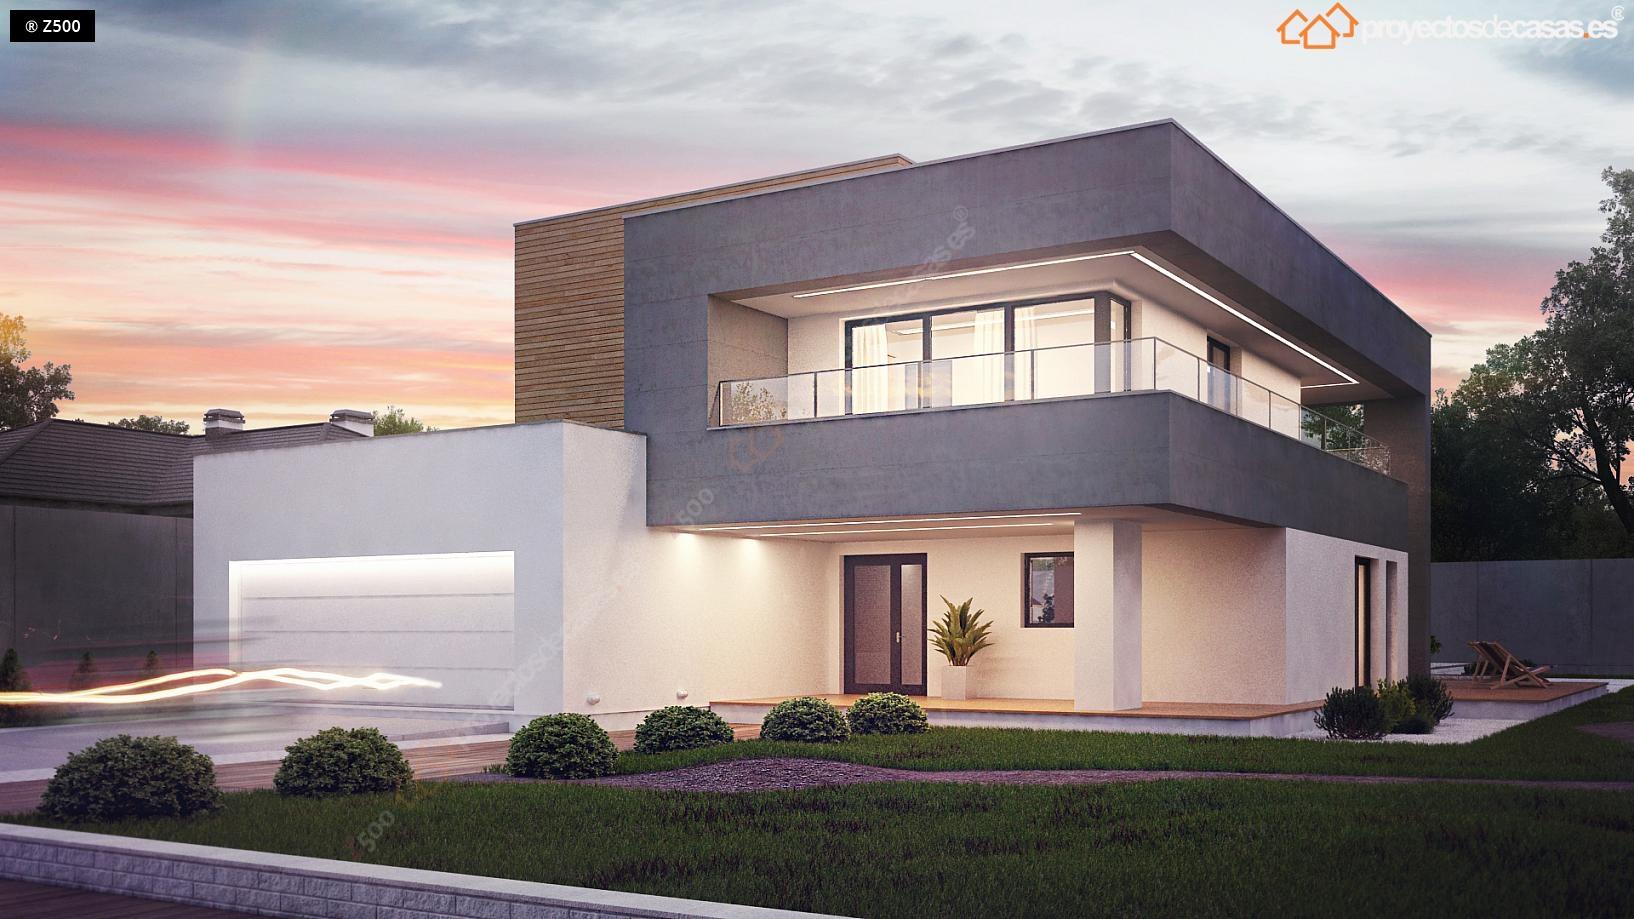 Casas modernas dise o y construcci n casa alicante - Casas planta baja modernas ...